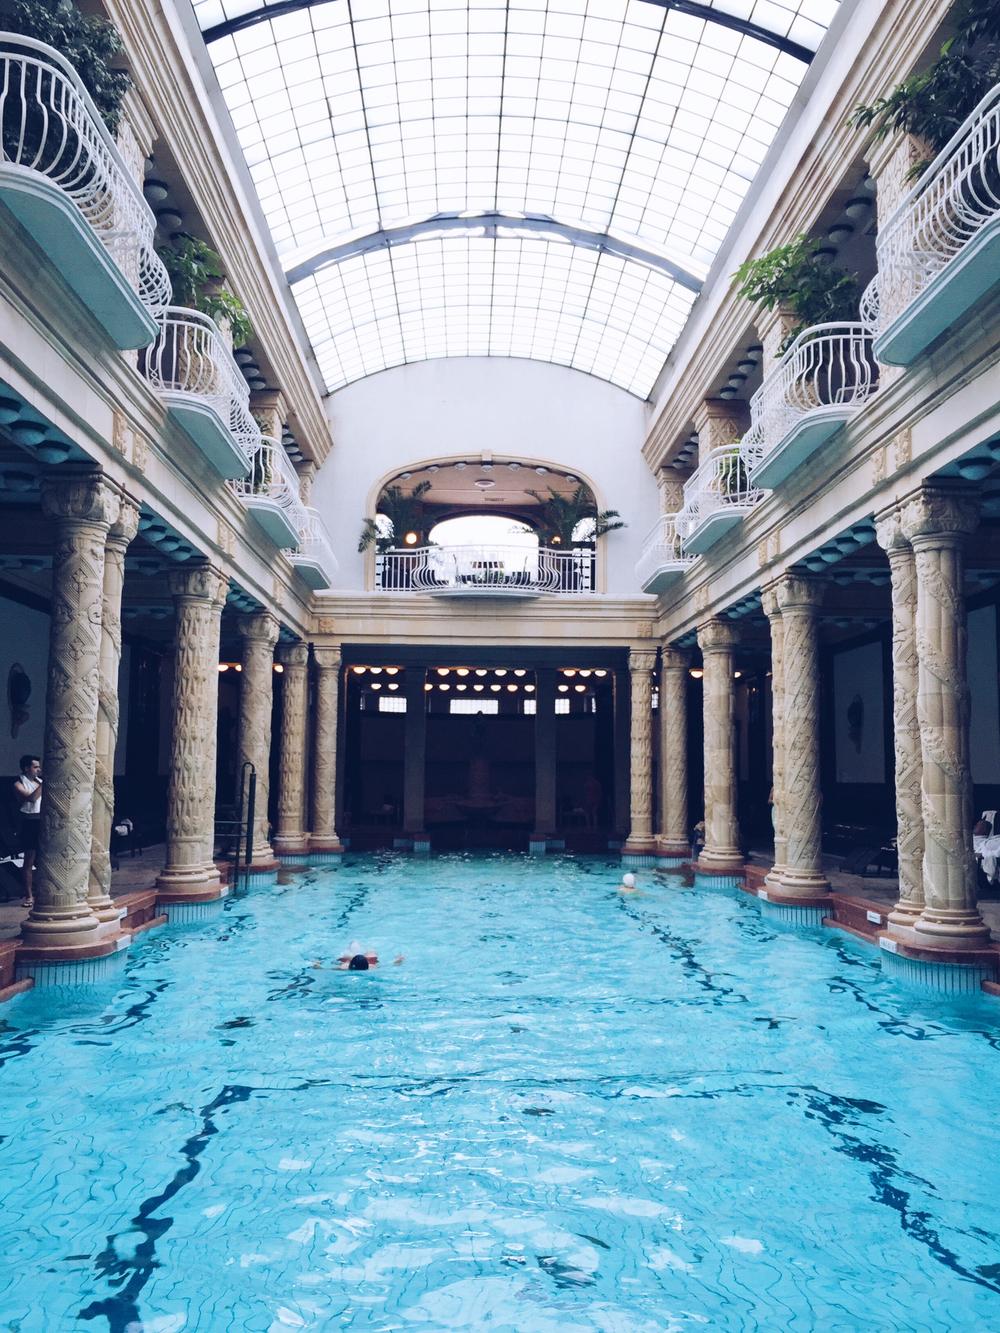 Gellert Spa & Bath